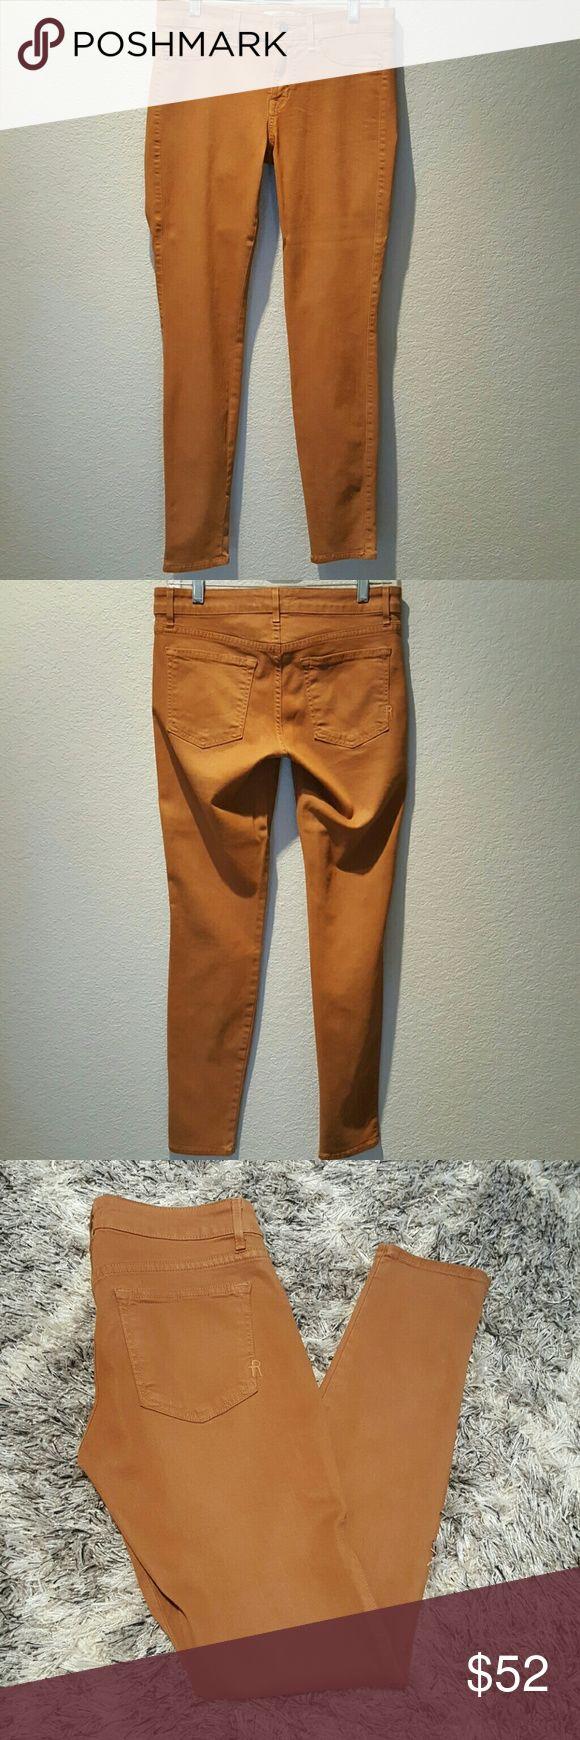 Rich & Skinny Skinny Jeans Beautiful tan/camel color Rich & Skinny Jeans Skinny